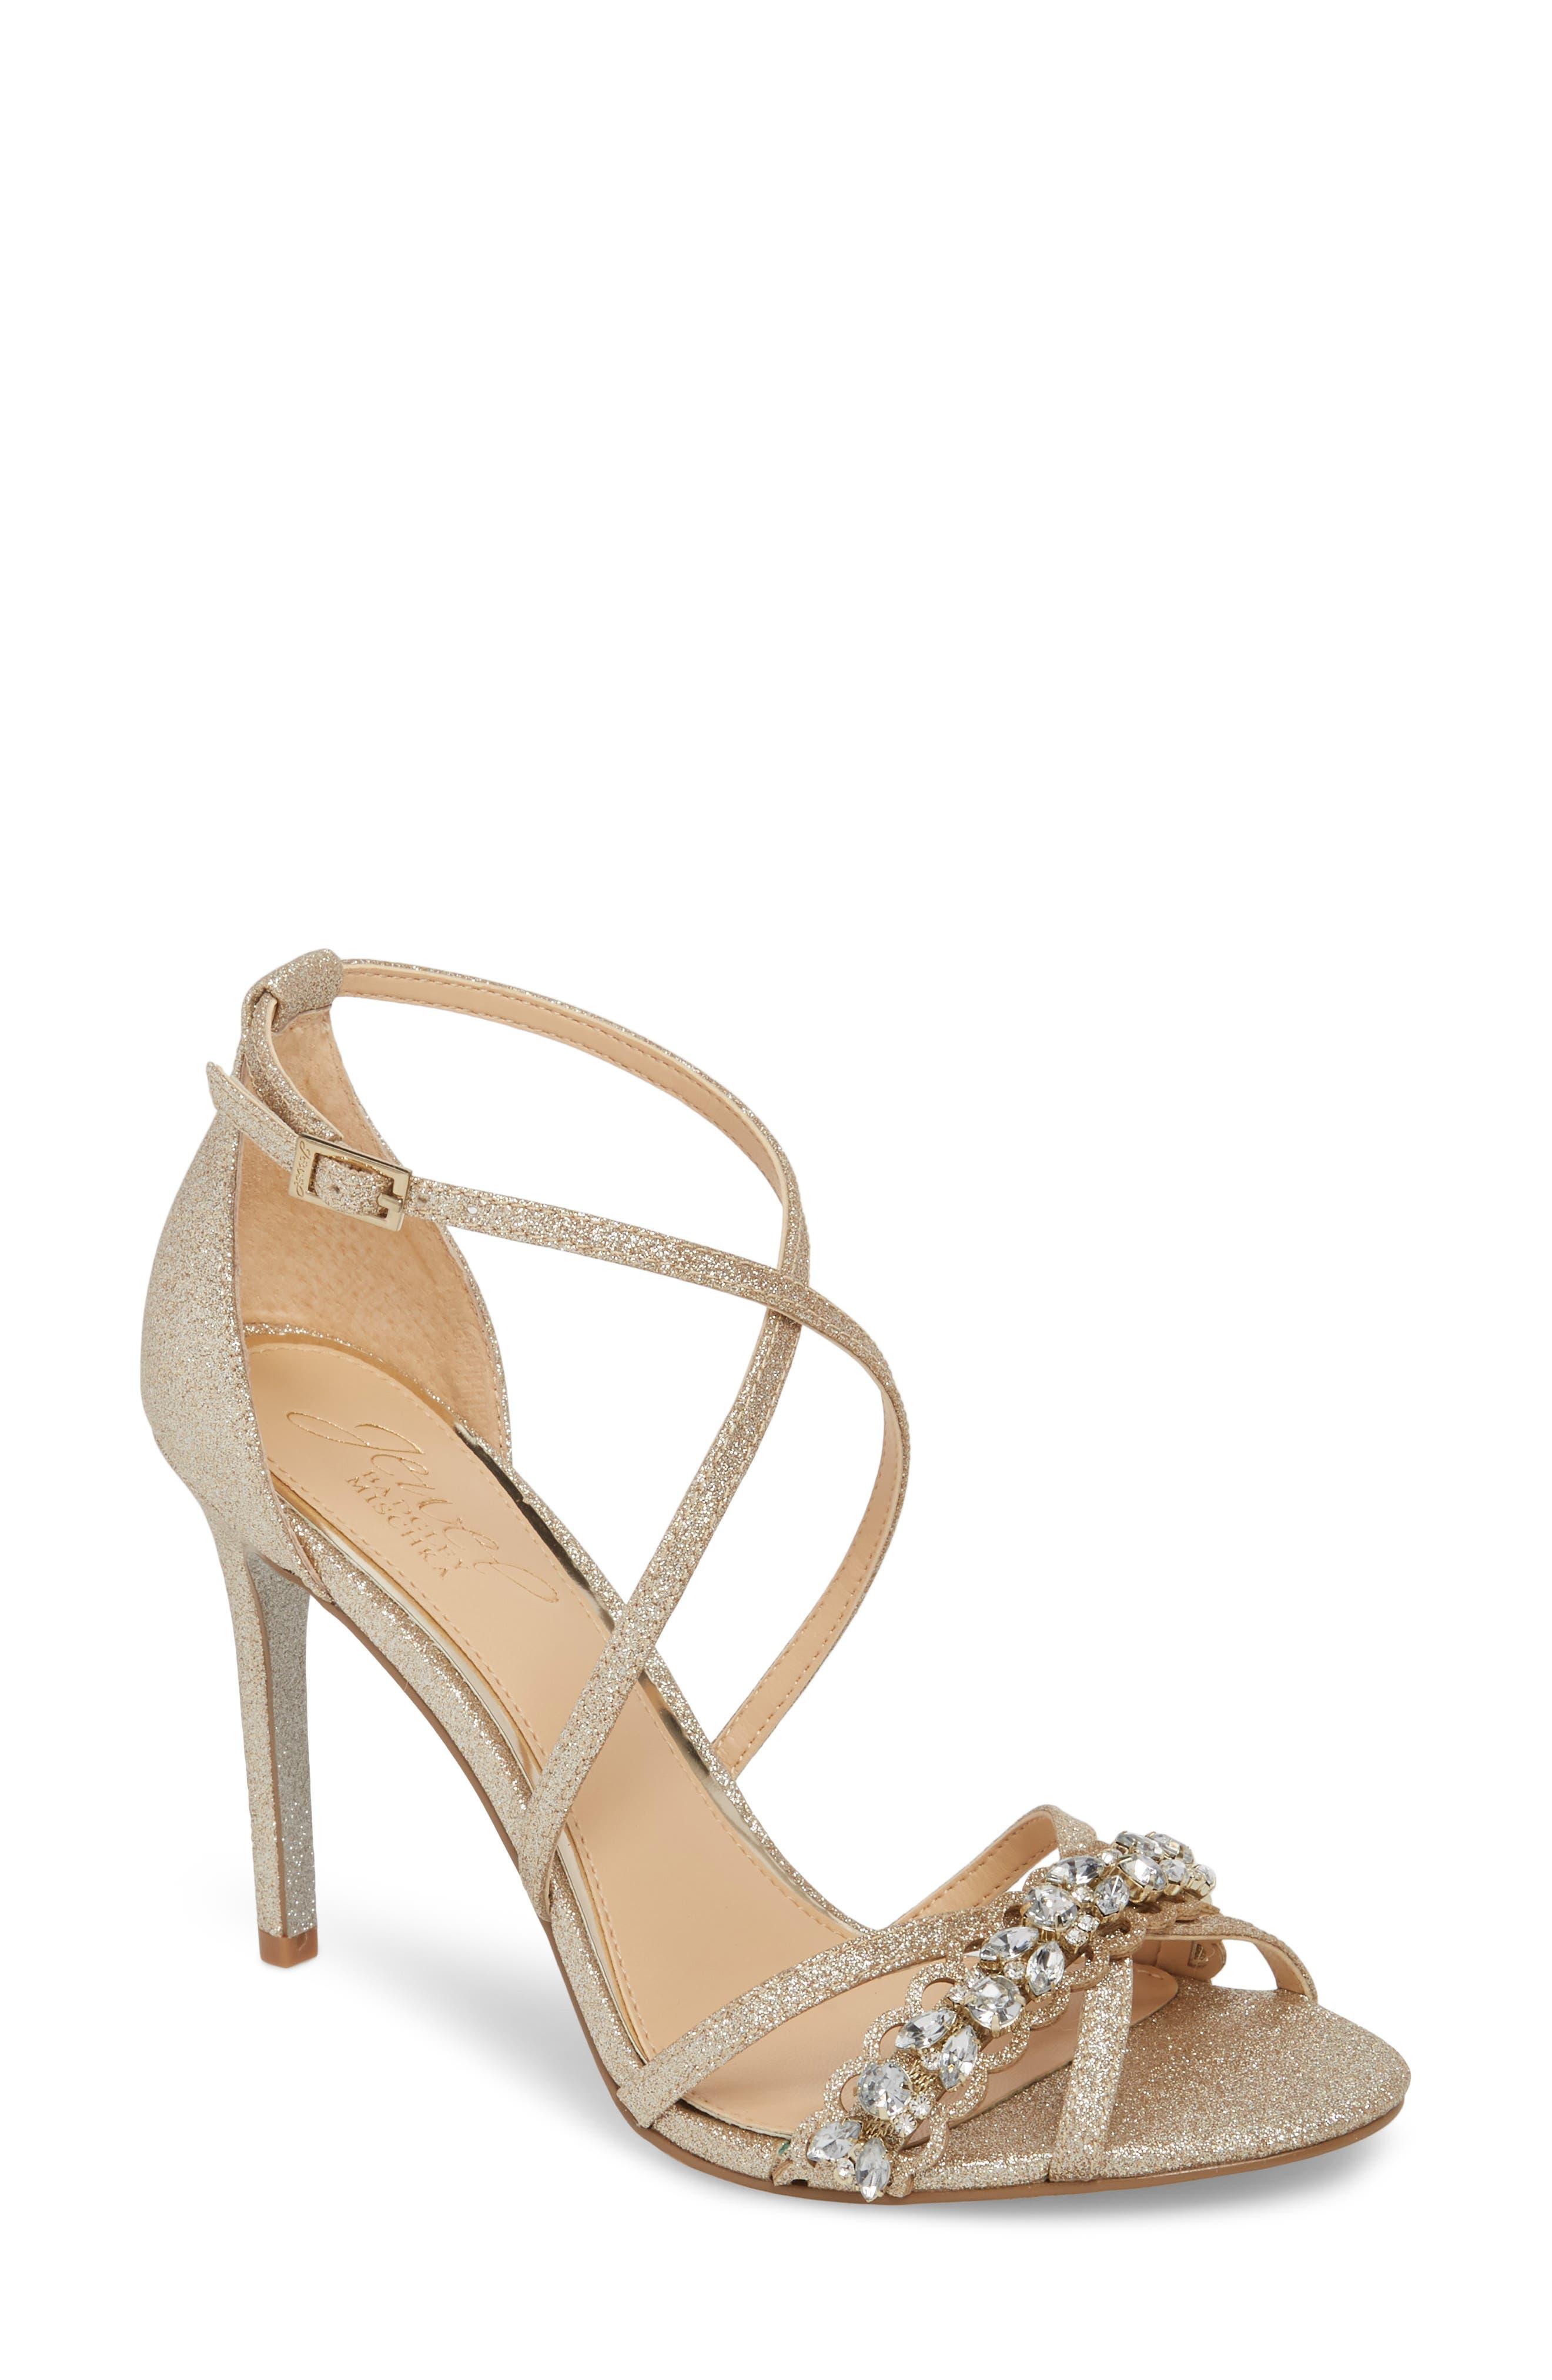 JEWEL BADGLEY MISCHKA Gisele Sandal, Main, color, LIGHT GOLD GLITTER FABRIC